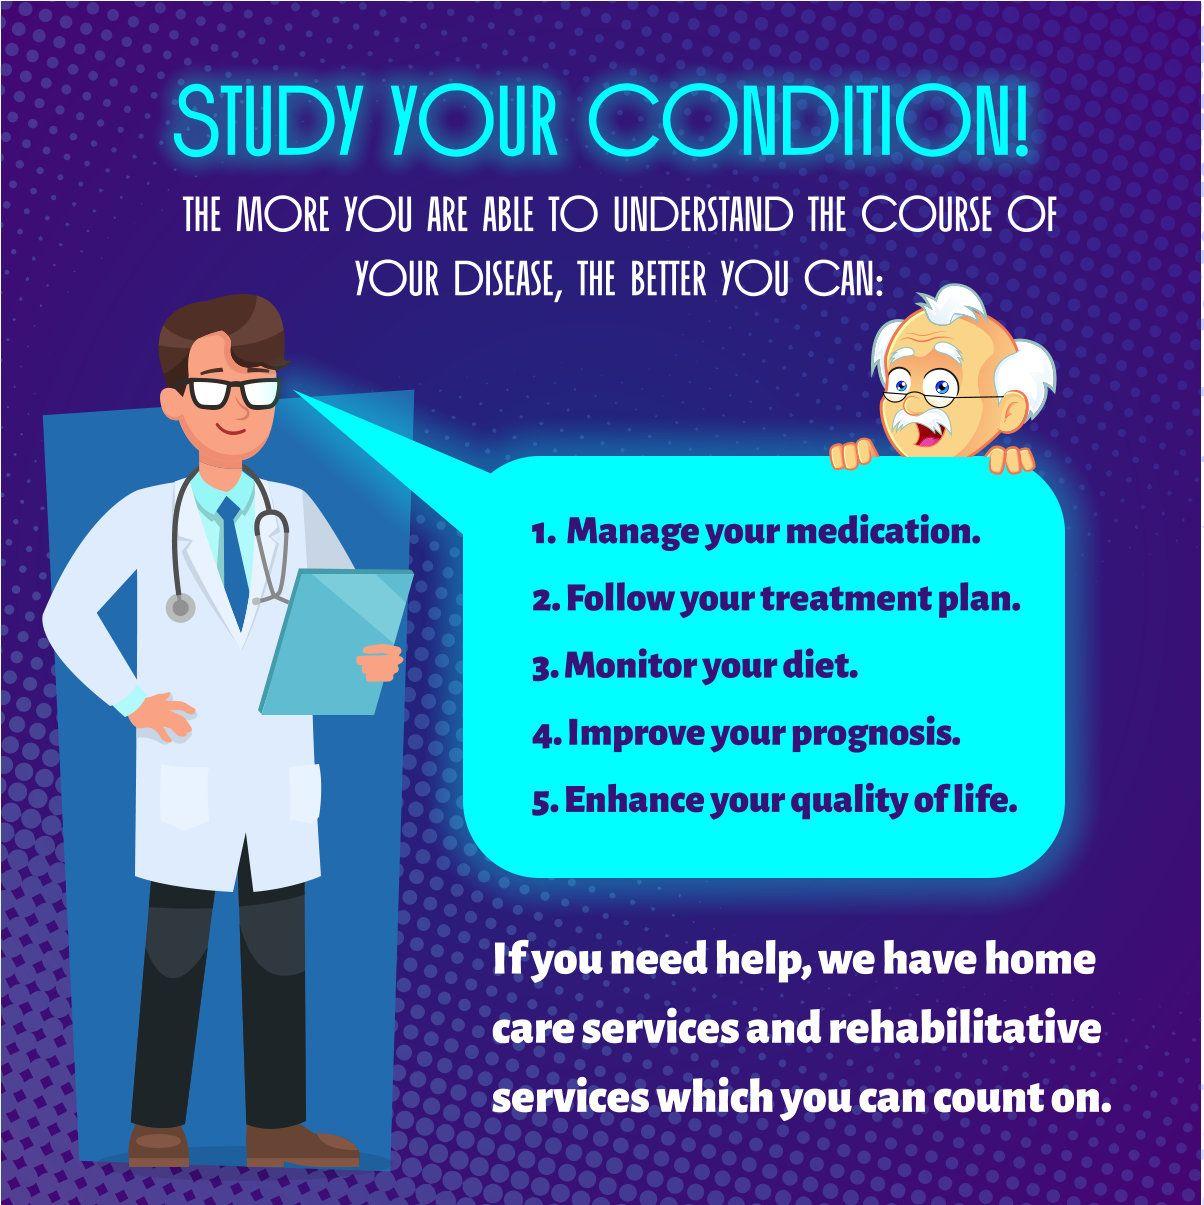 Home Treatment plan, Wellness center, Improve yourself